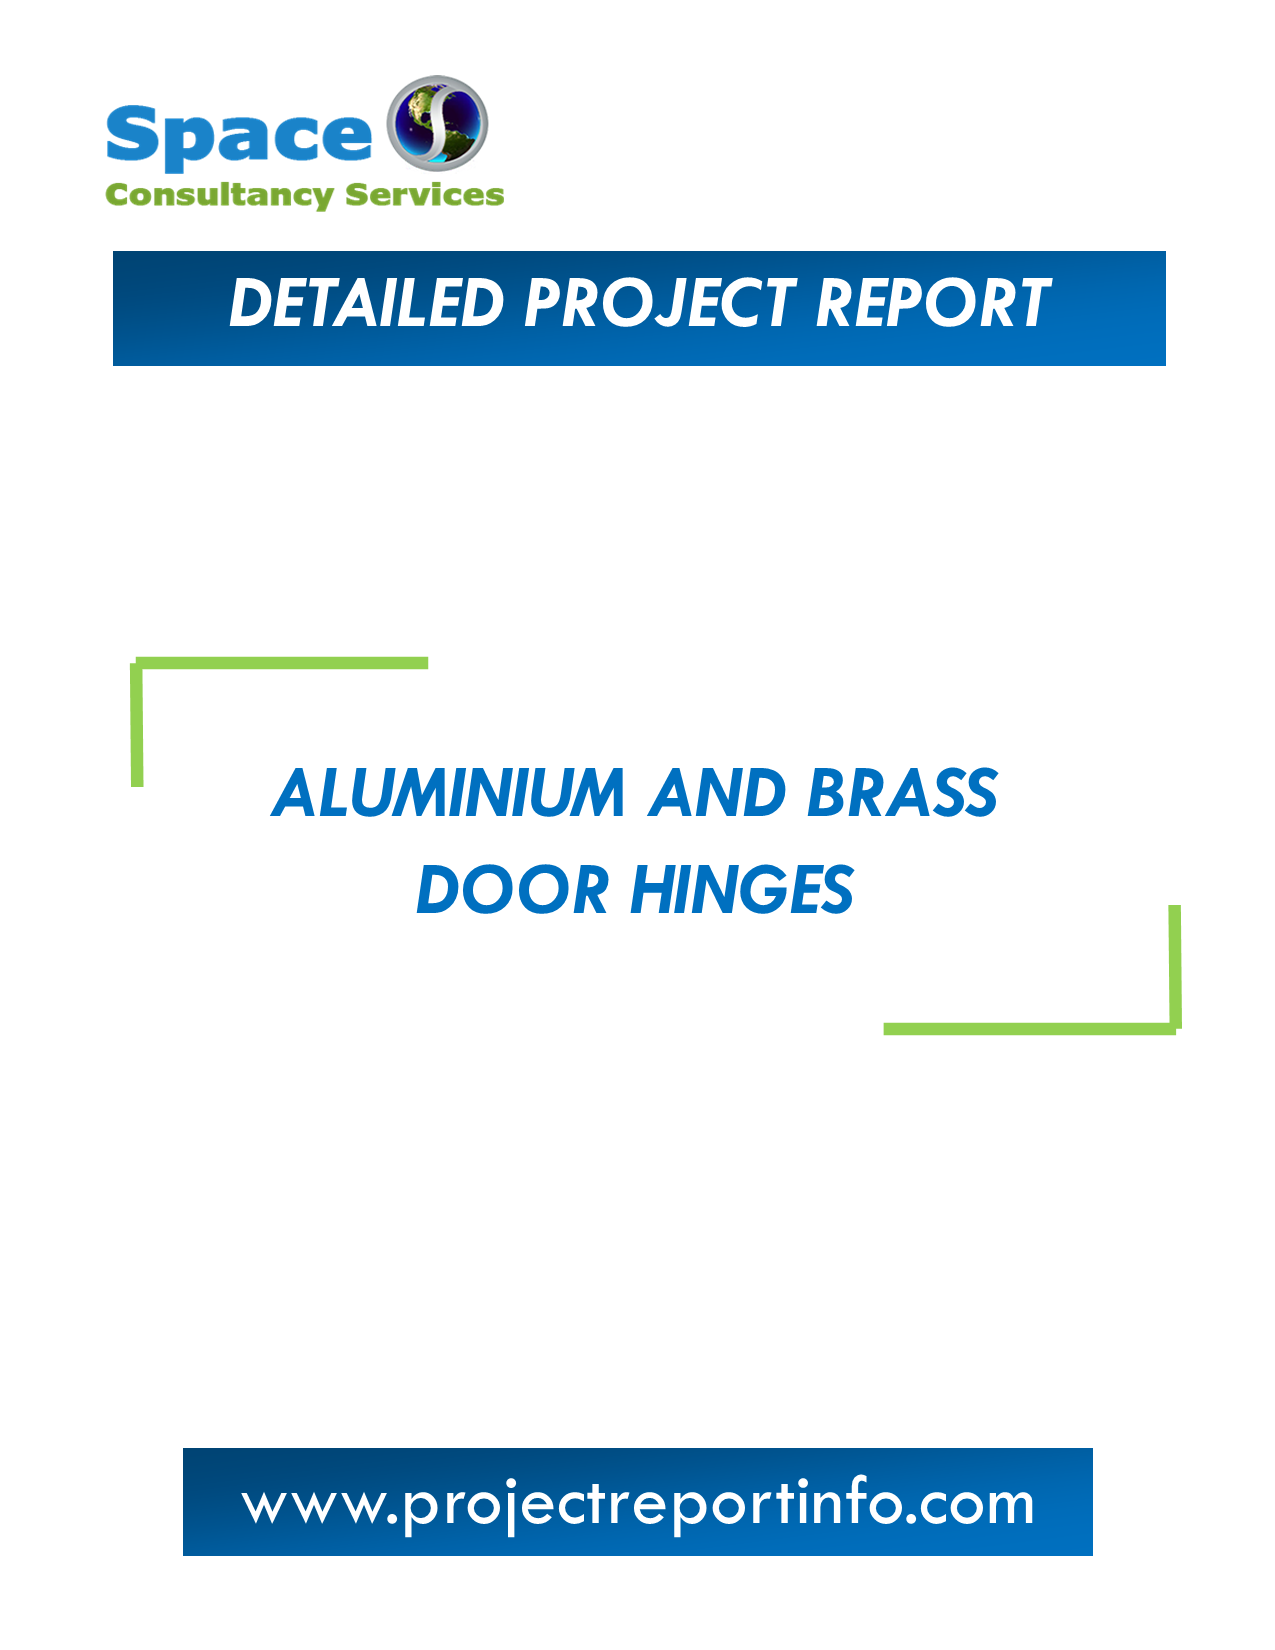 Project Report on Aluminium and Brass Door Hinges